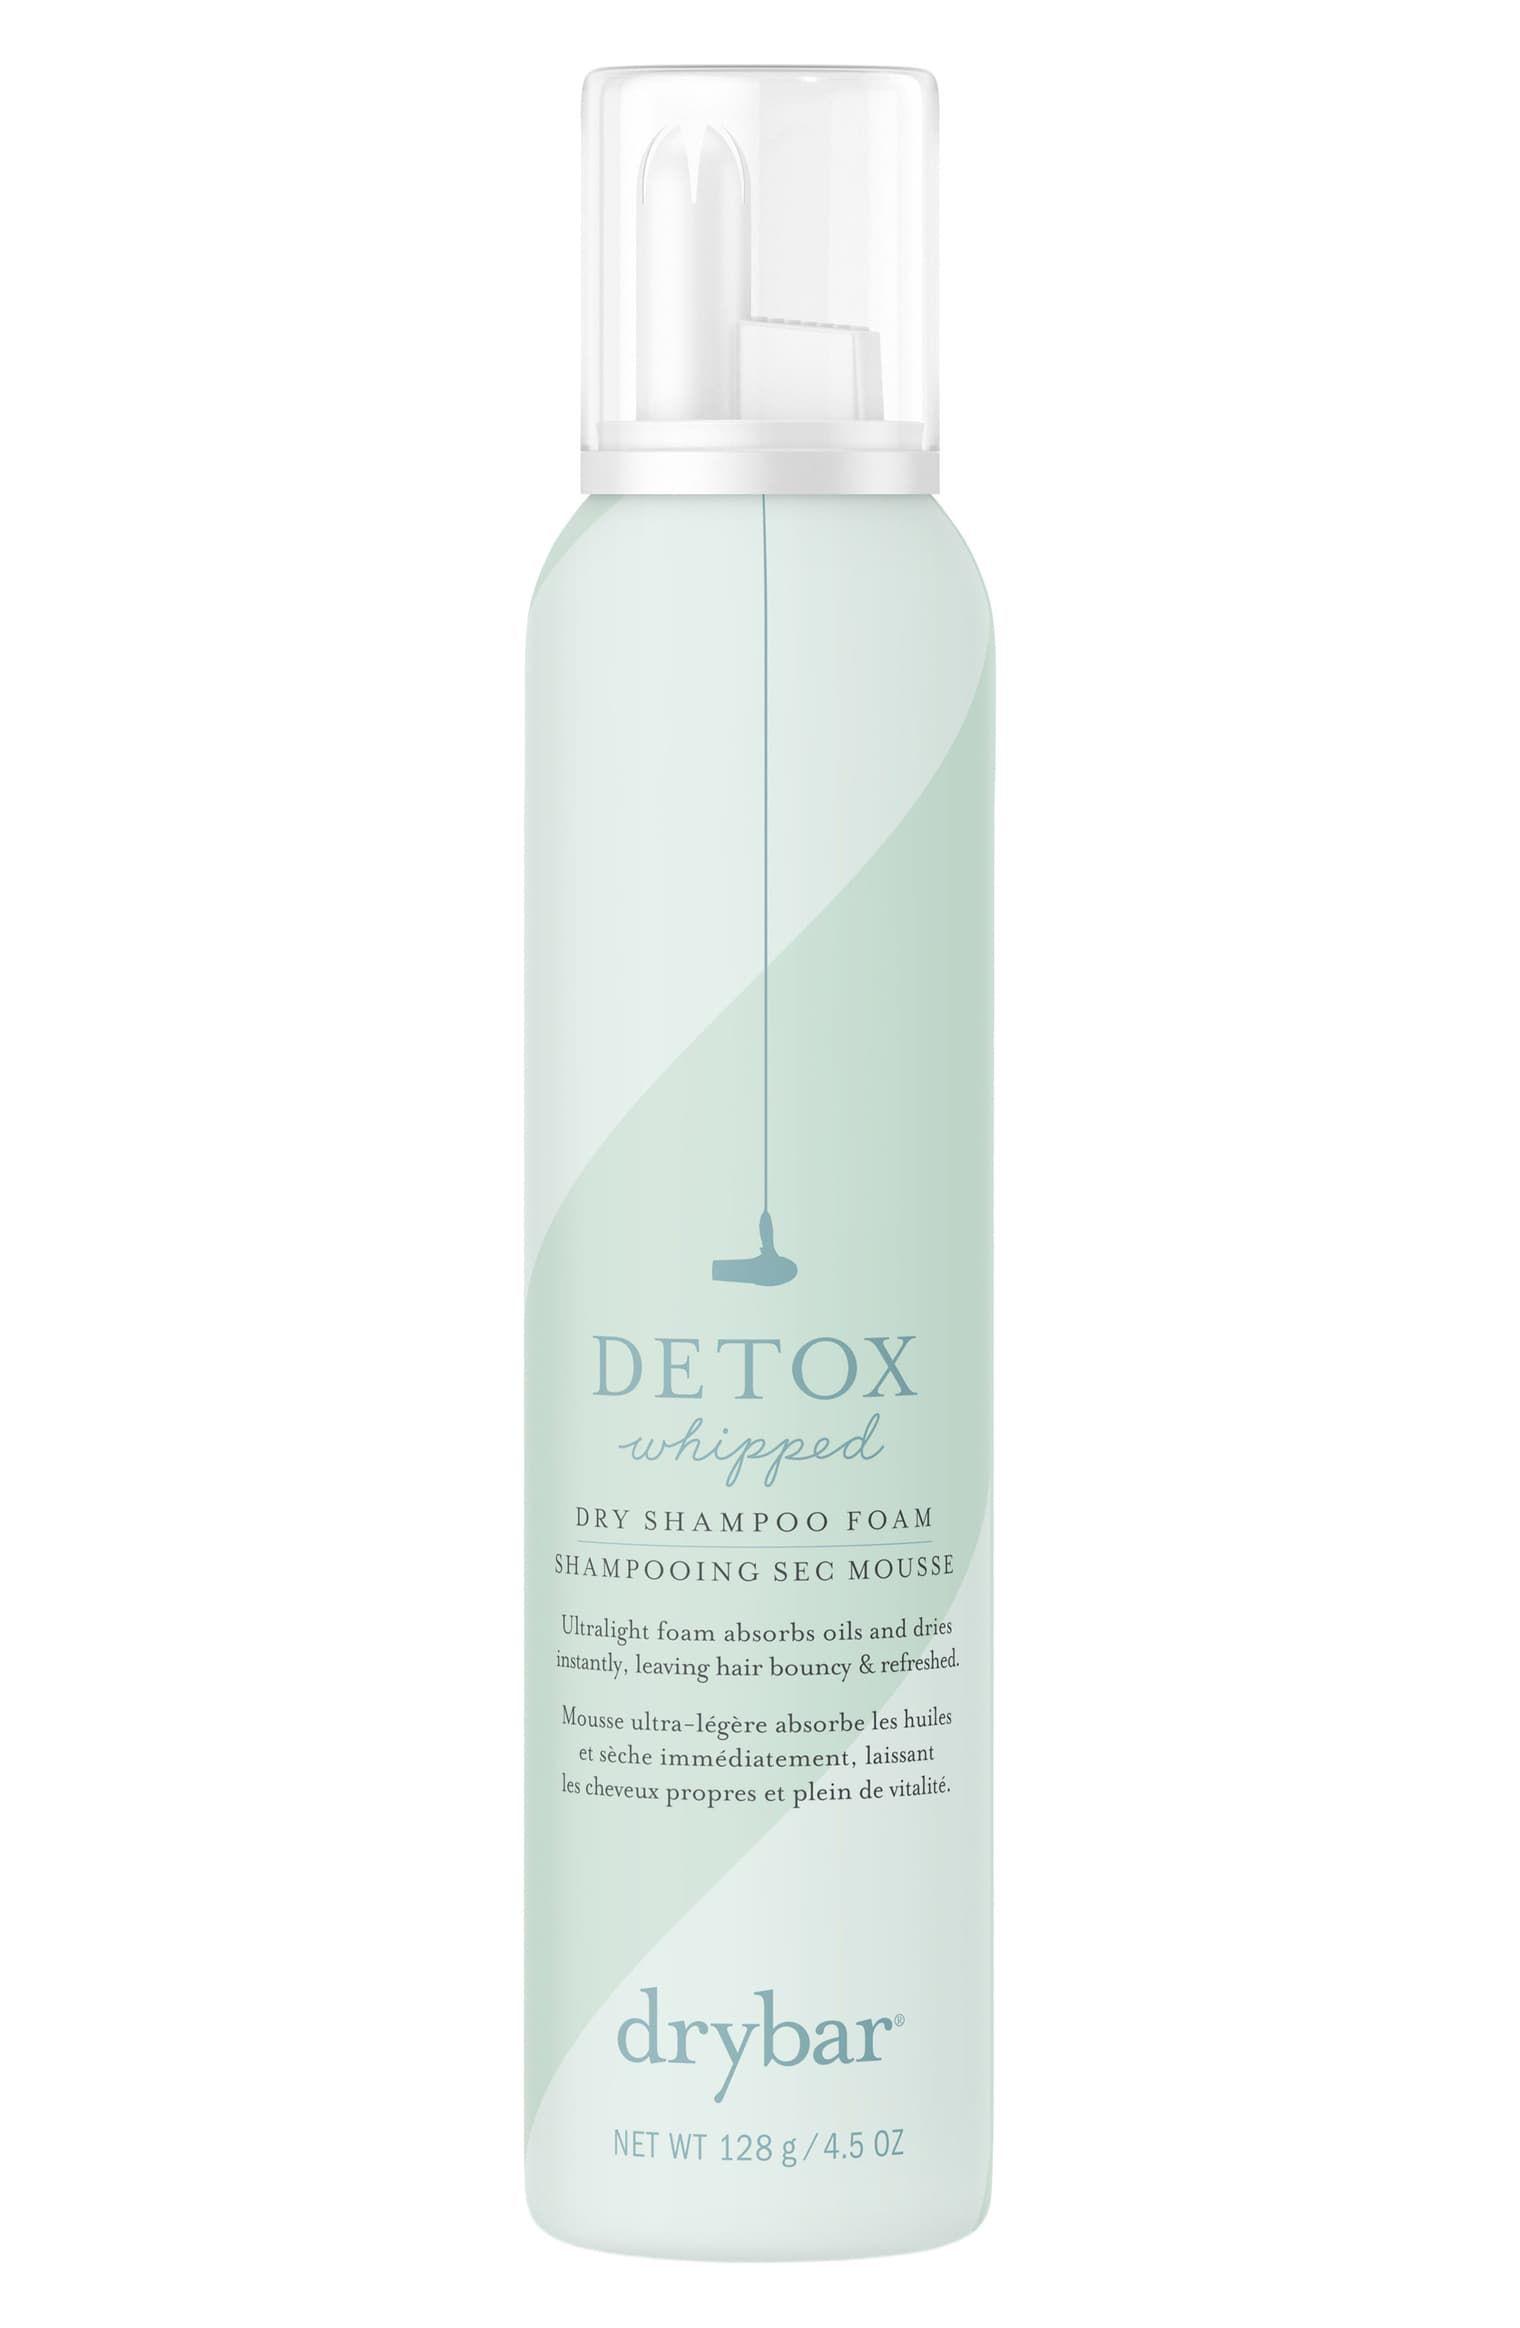 Drybar Detox Whipped Dry Shampoo Foam Nordstrom Dry Shampoo Shampoo Drybar